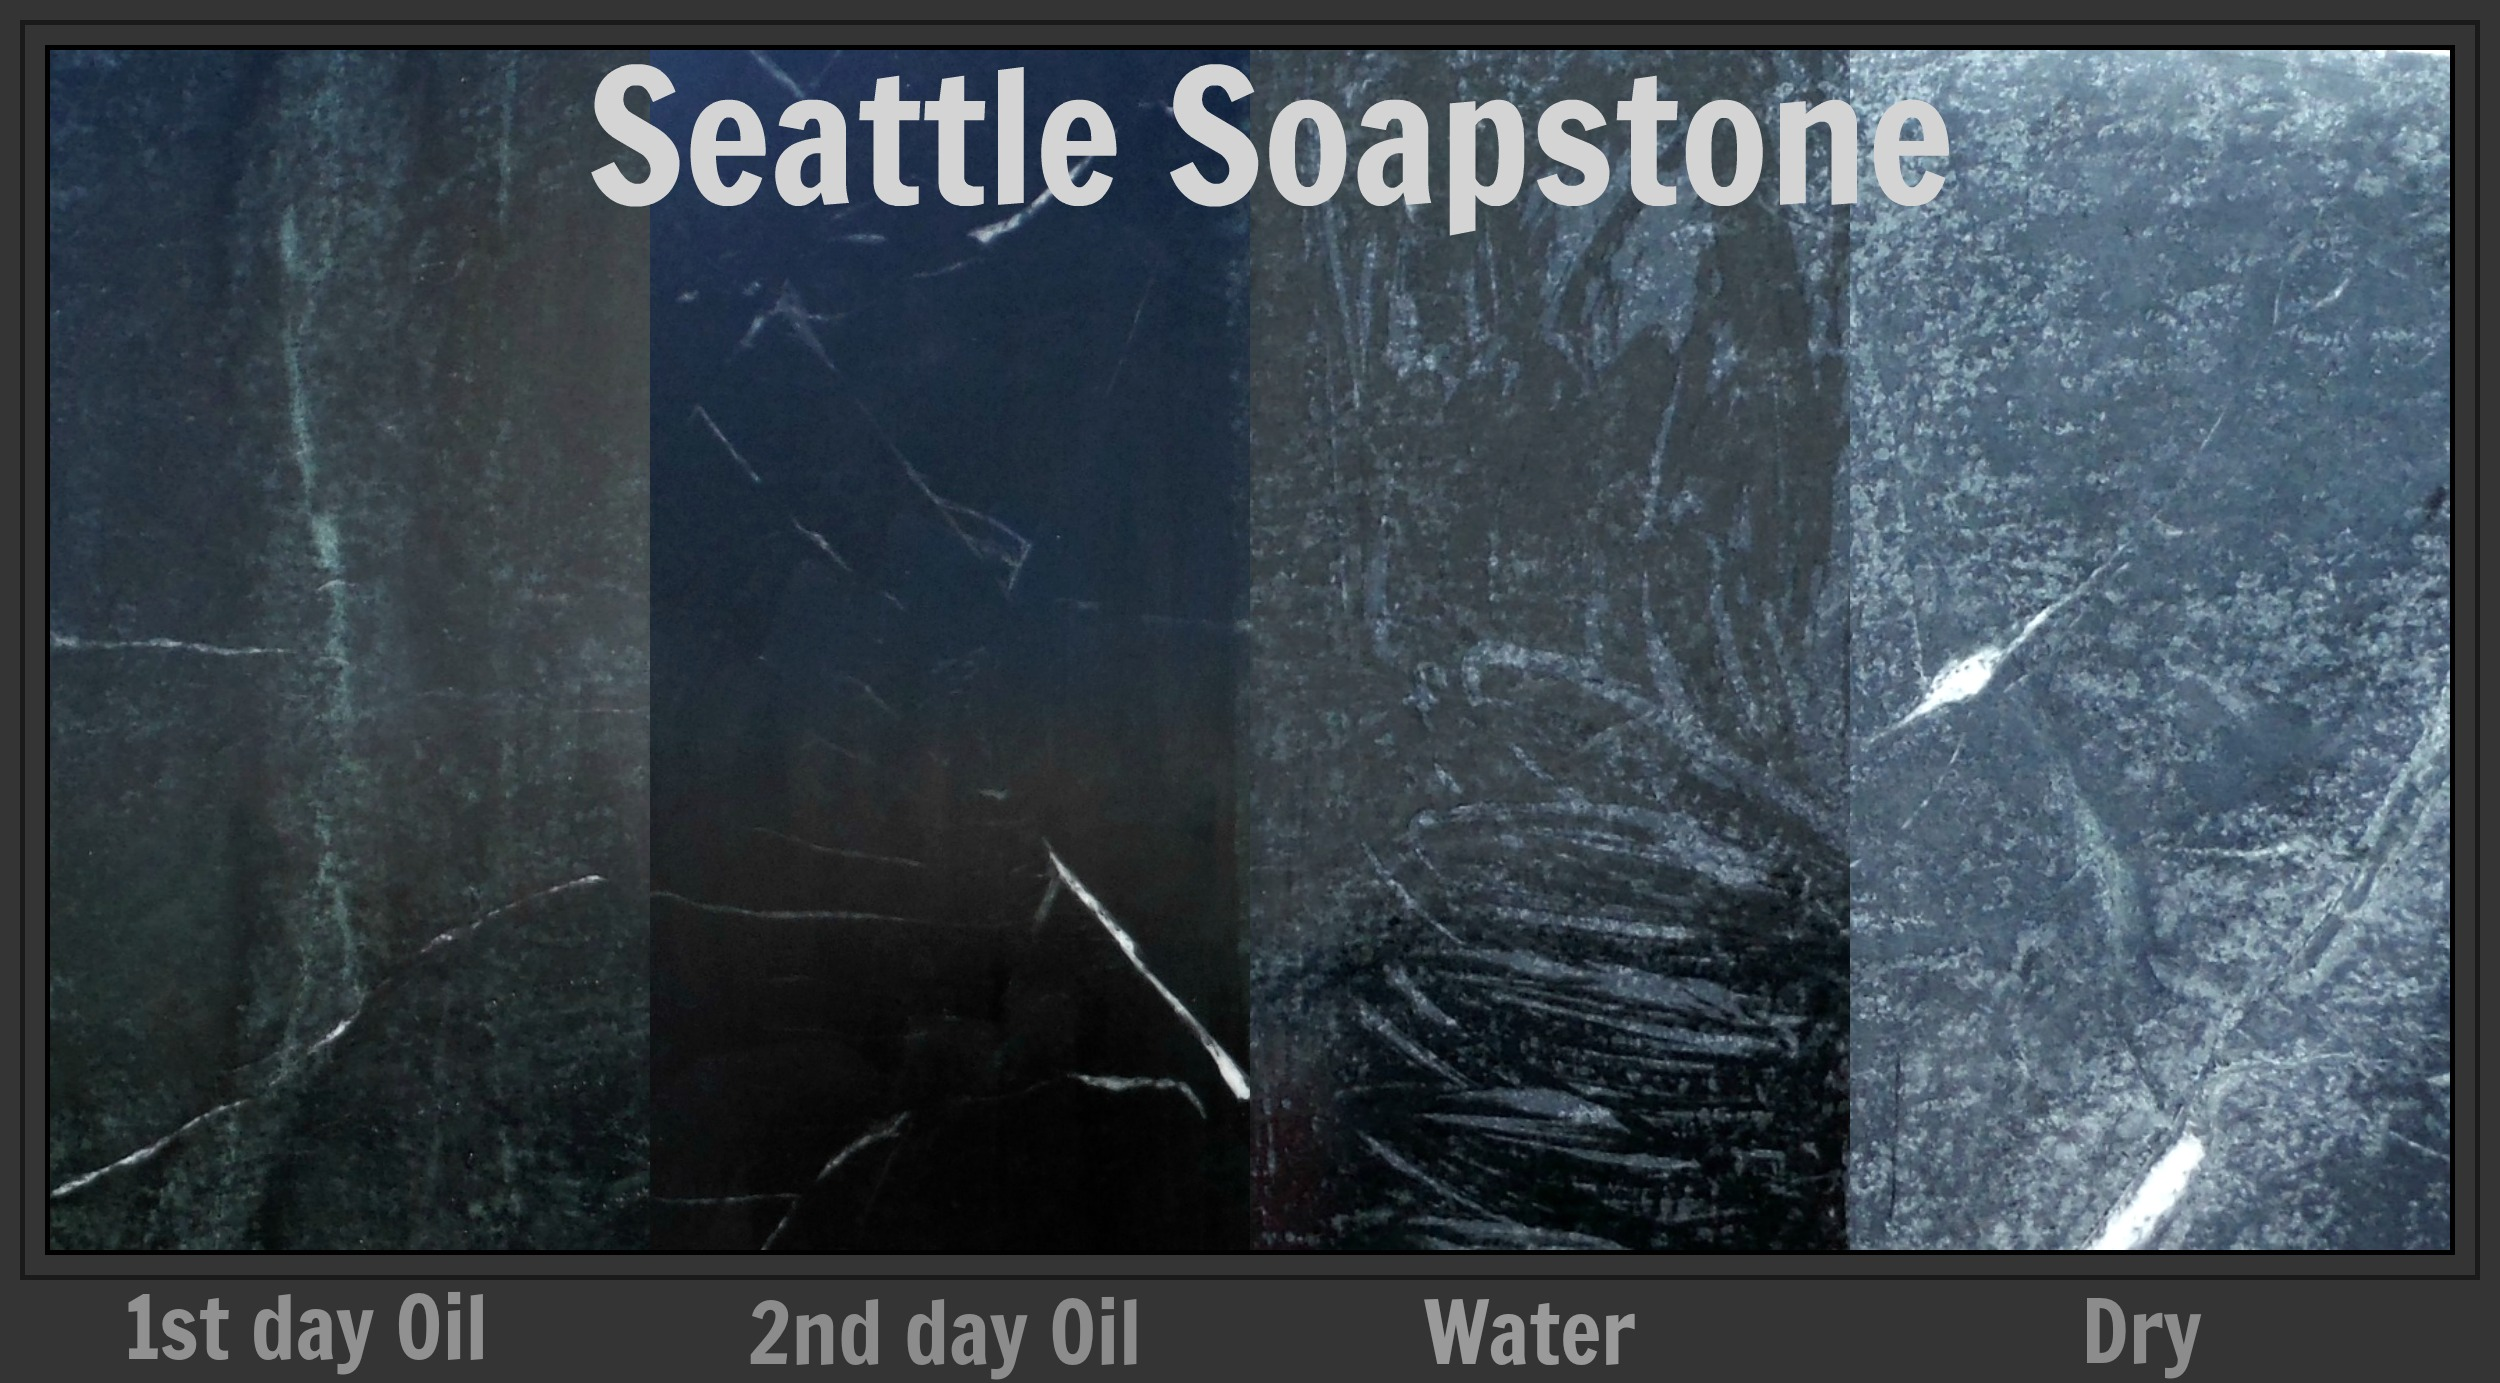 Soapstone Seattle Dry Oil